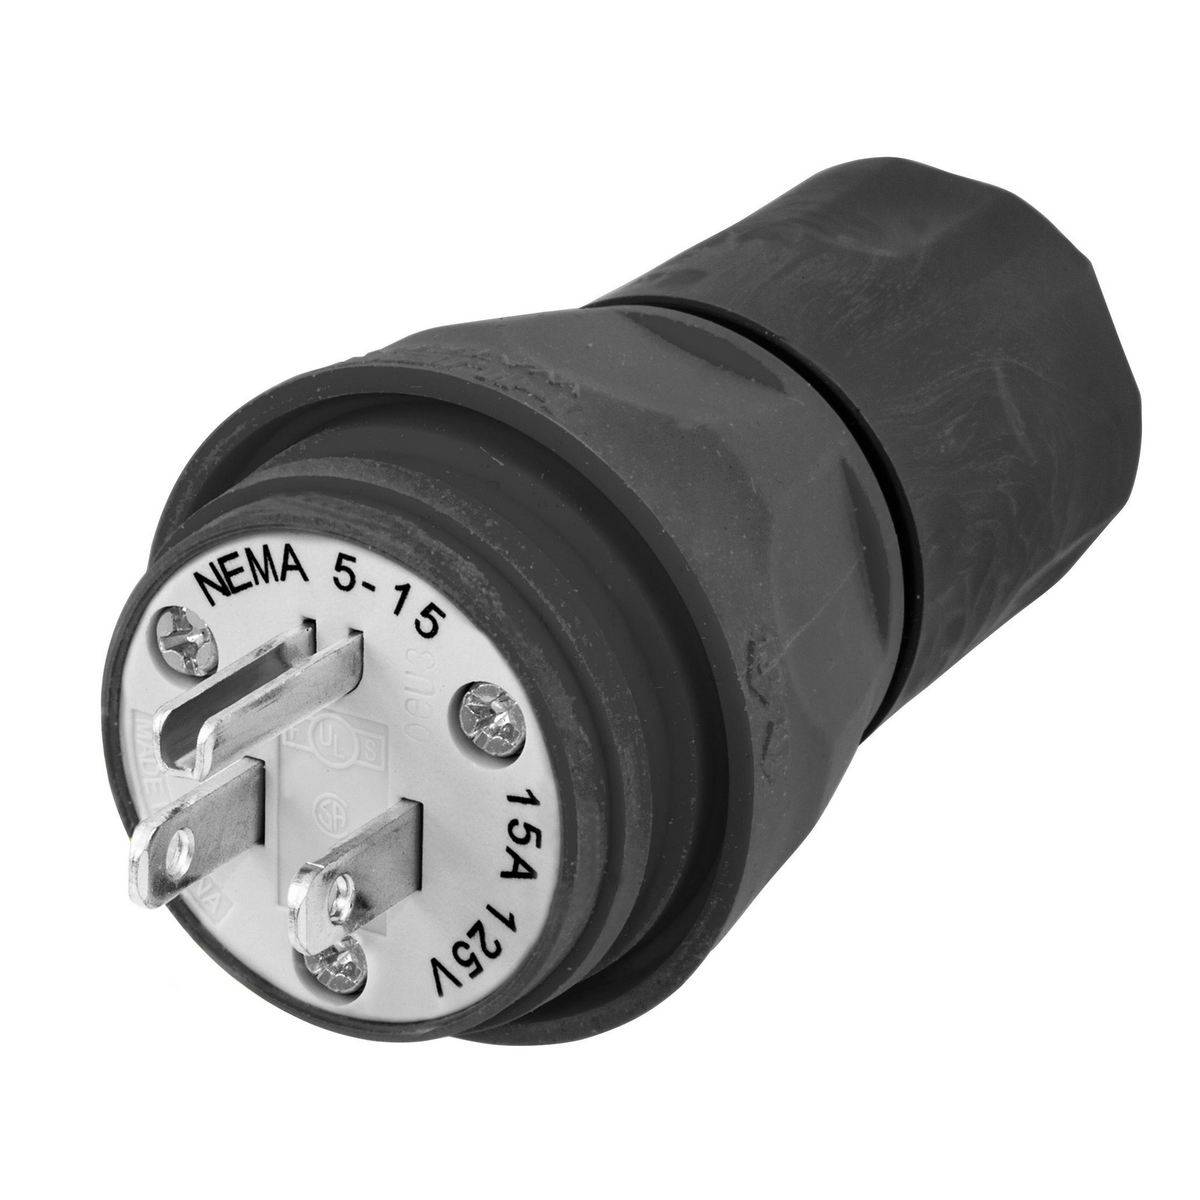 Hubbell HBL14W47BK Plug, w/TIGHT, 5-15P, 15A 125V, BK